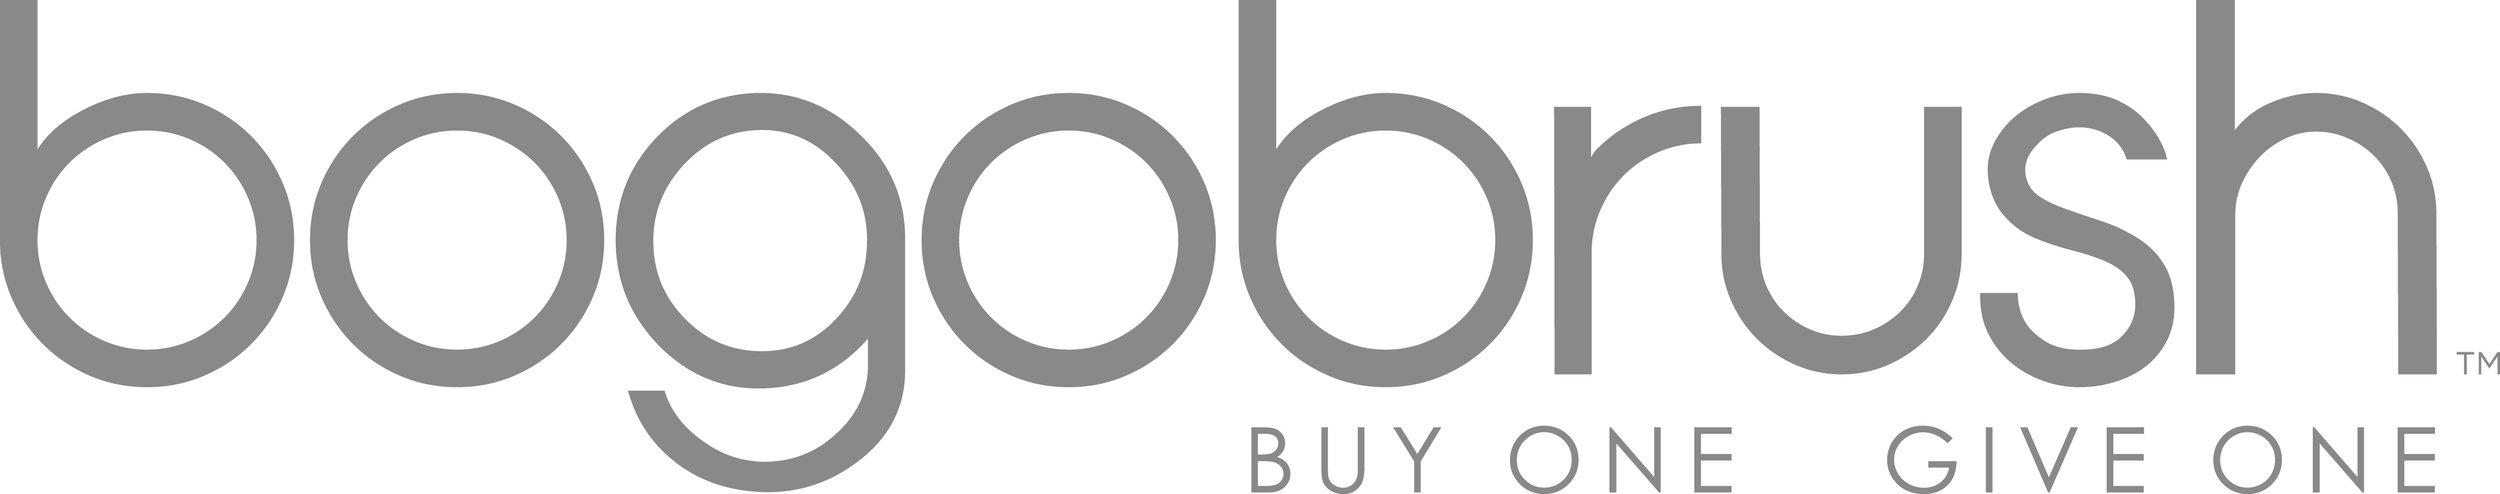 bogobrush_logo.jpg